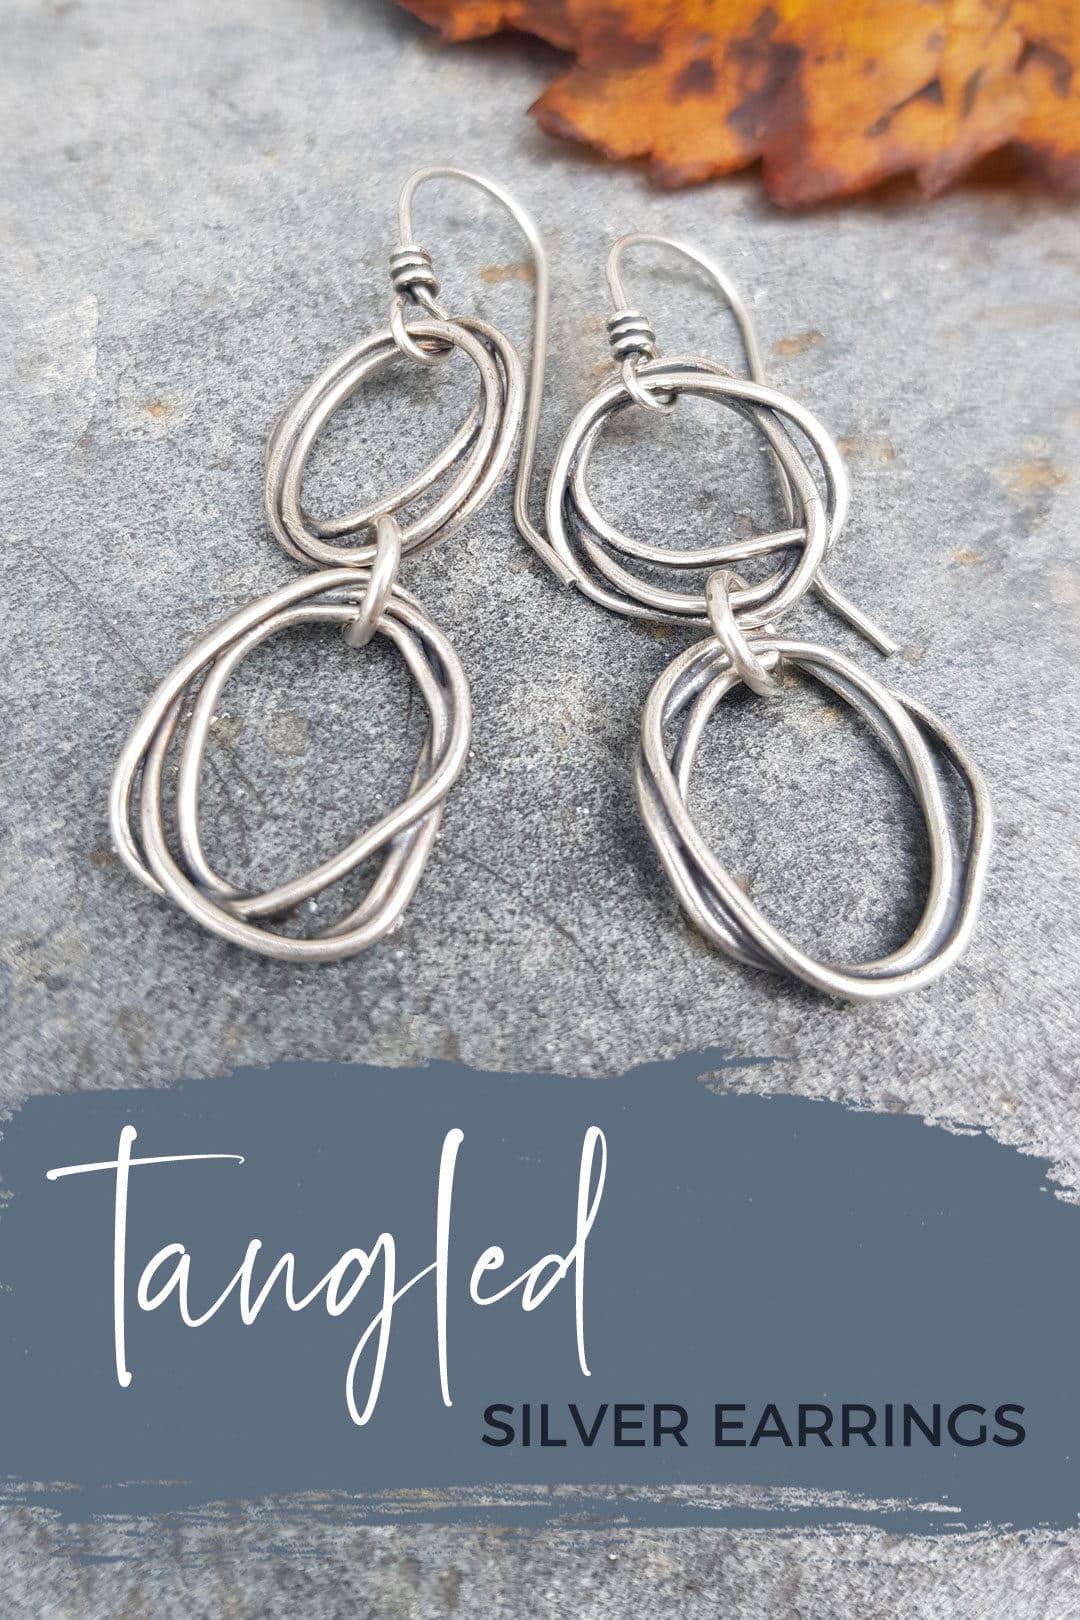 Tangled silver earrings